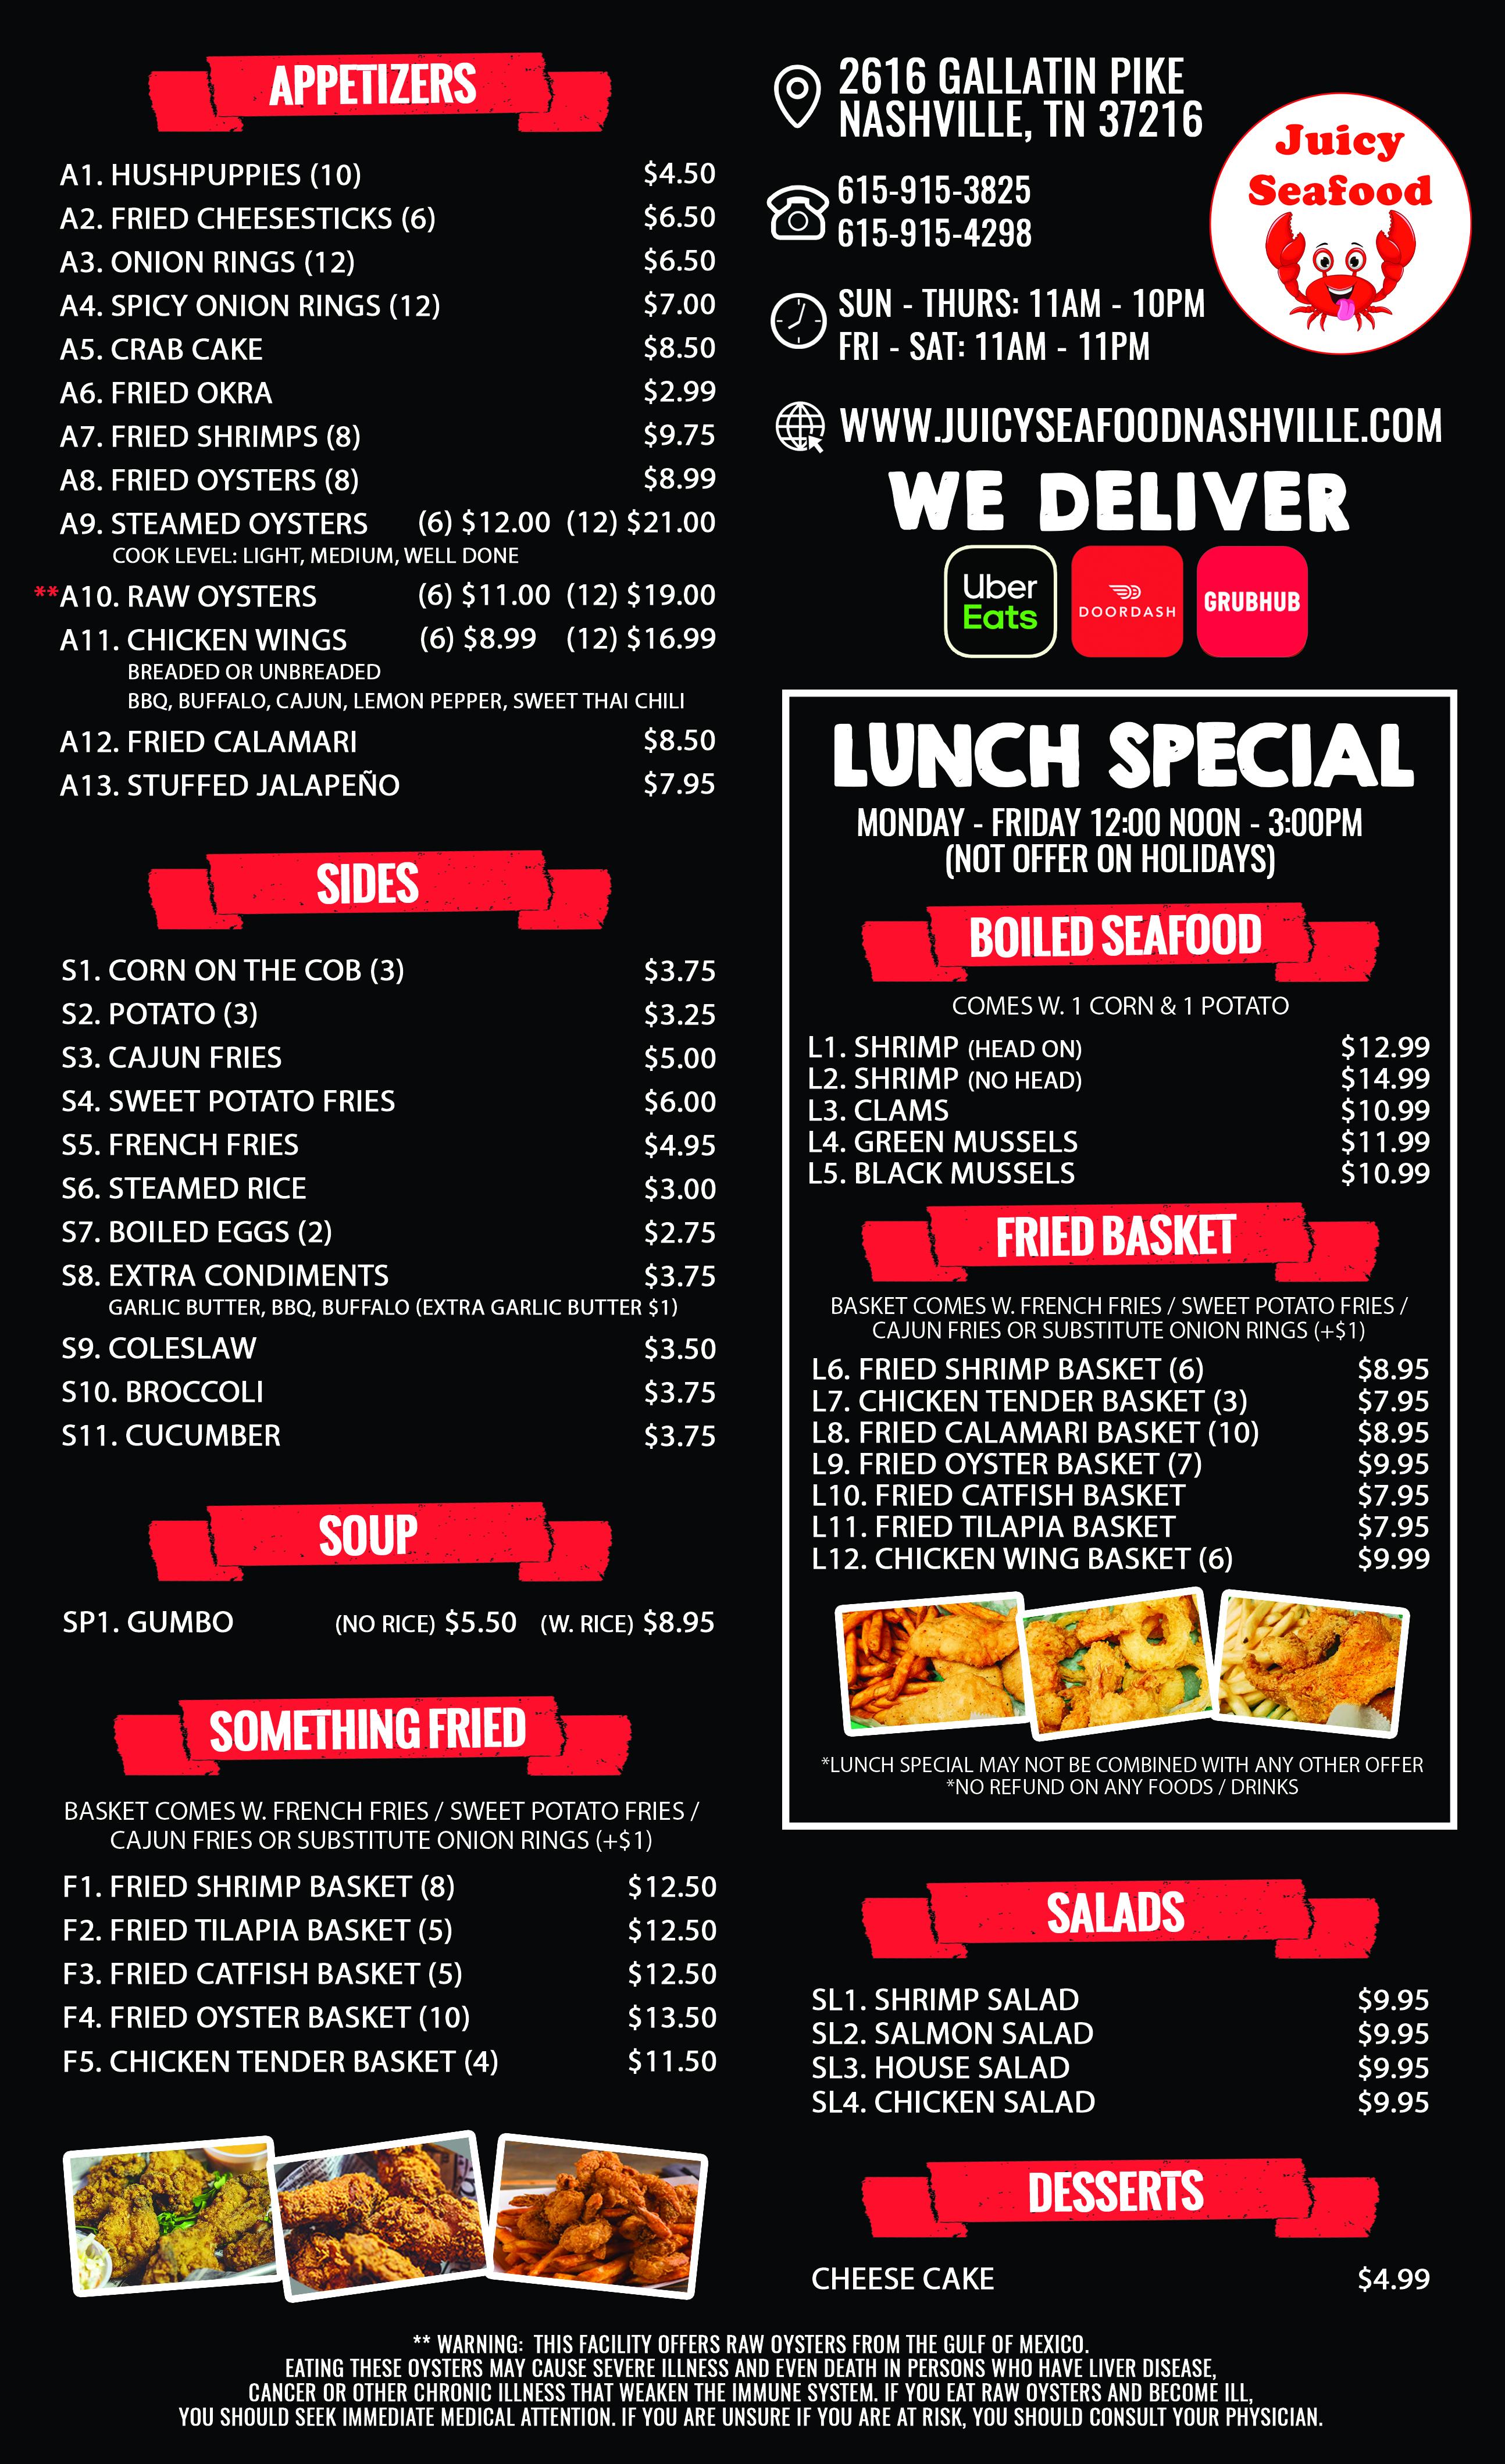 Cajun Combo Dish Juicy Seafood Menu In Tennessee Nashville